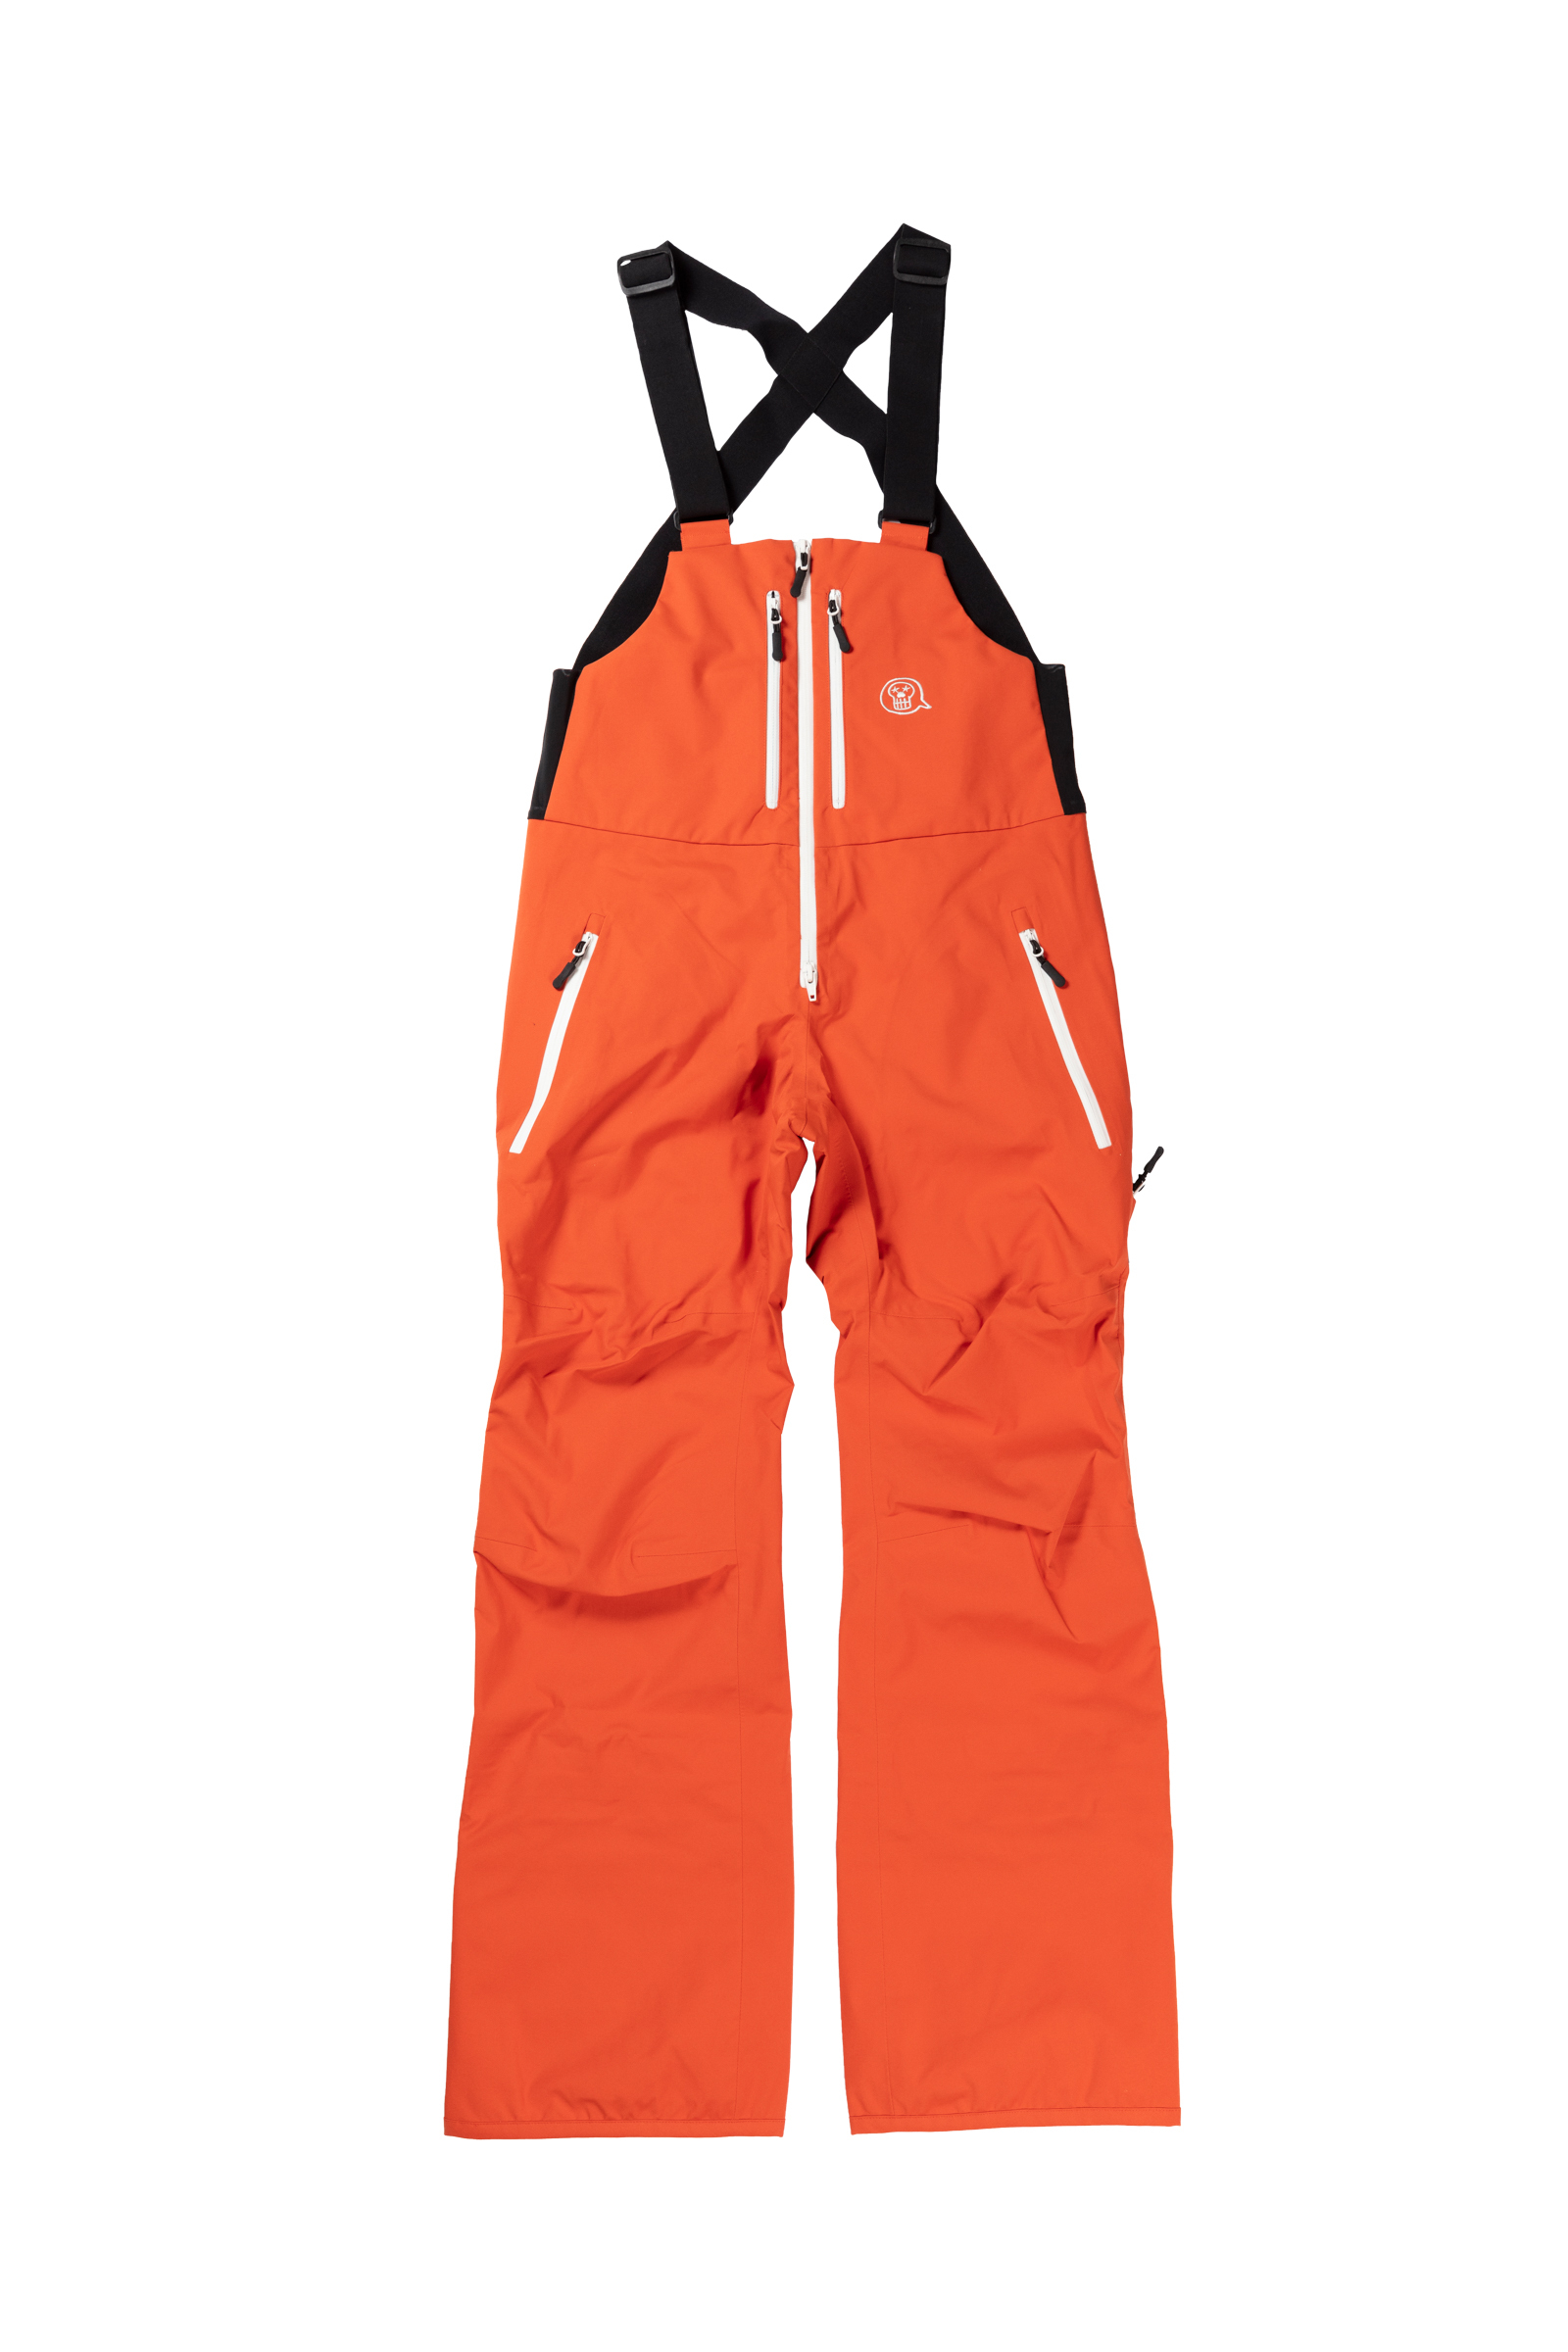 2021unfudge snow wear // SMOKE BIB PANTS // ORANGE / 10月中旬発送